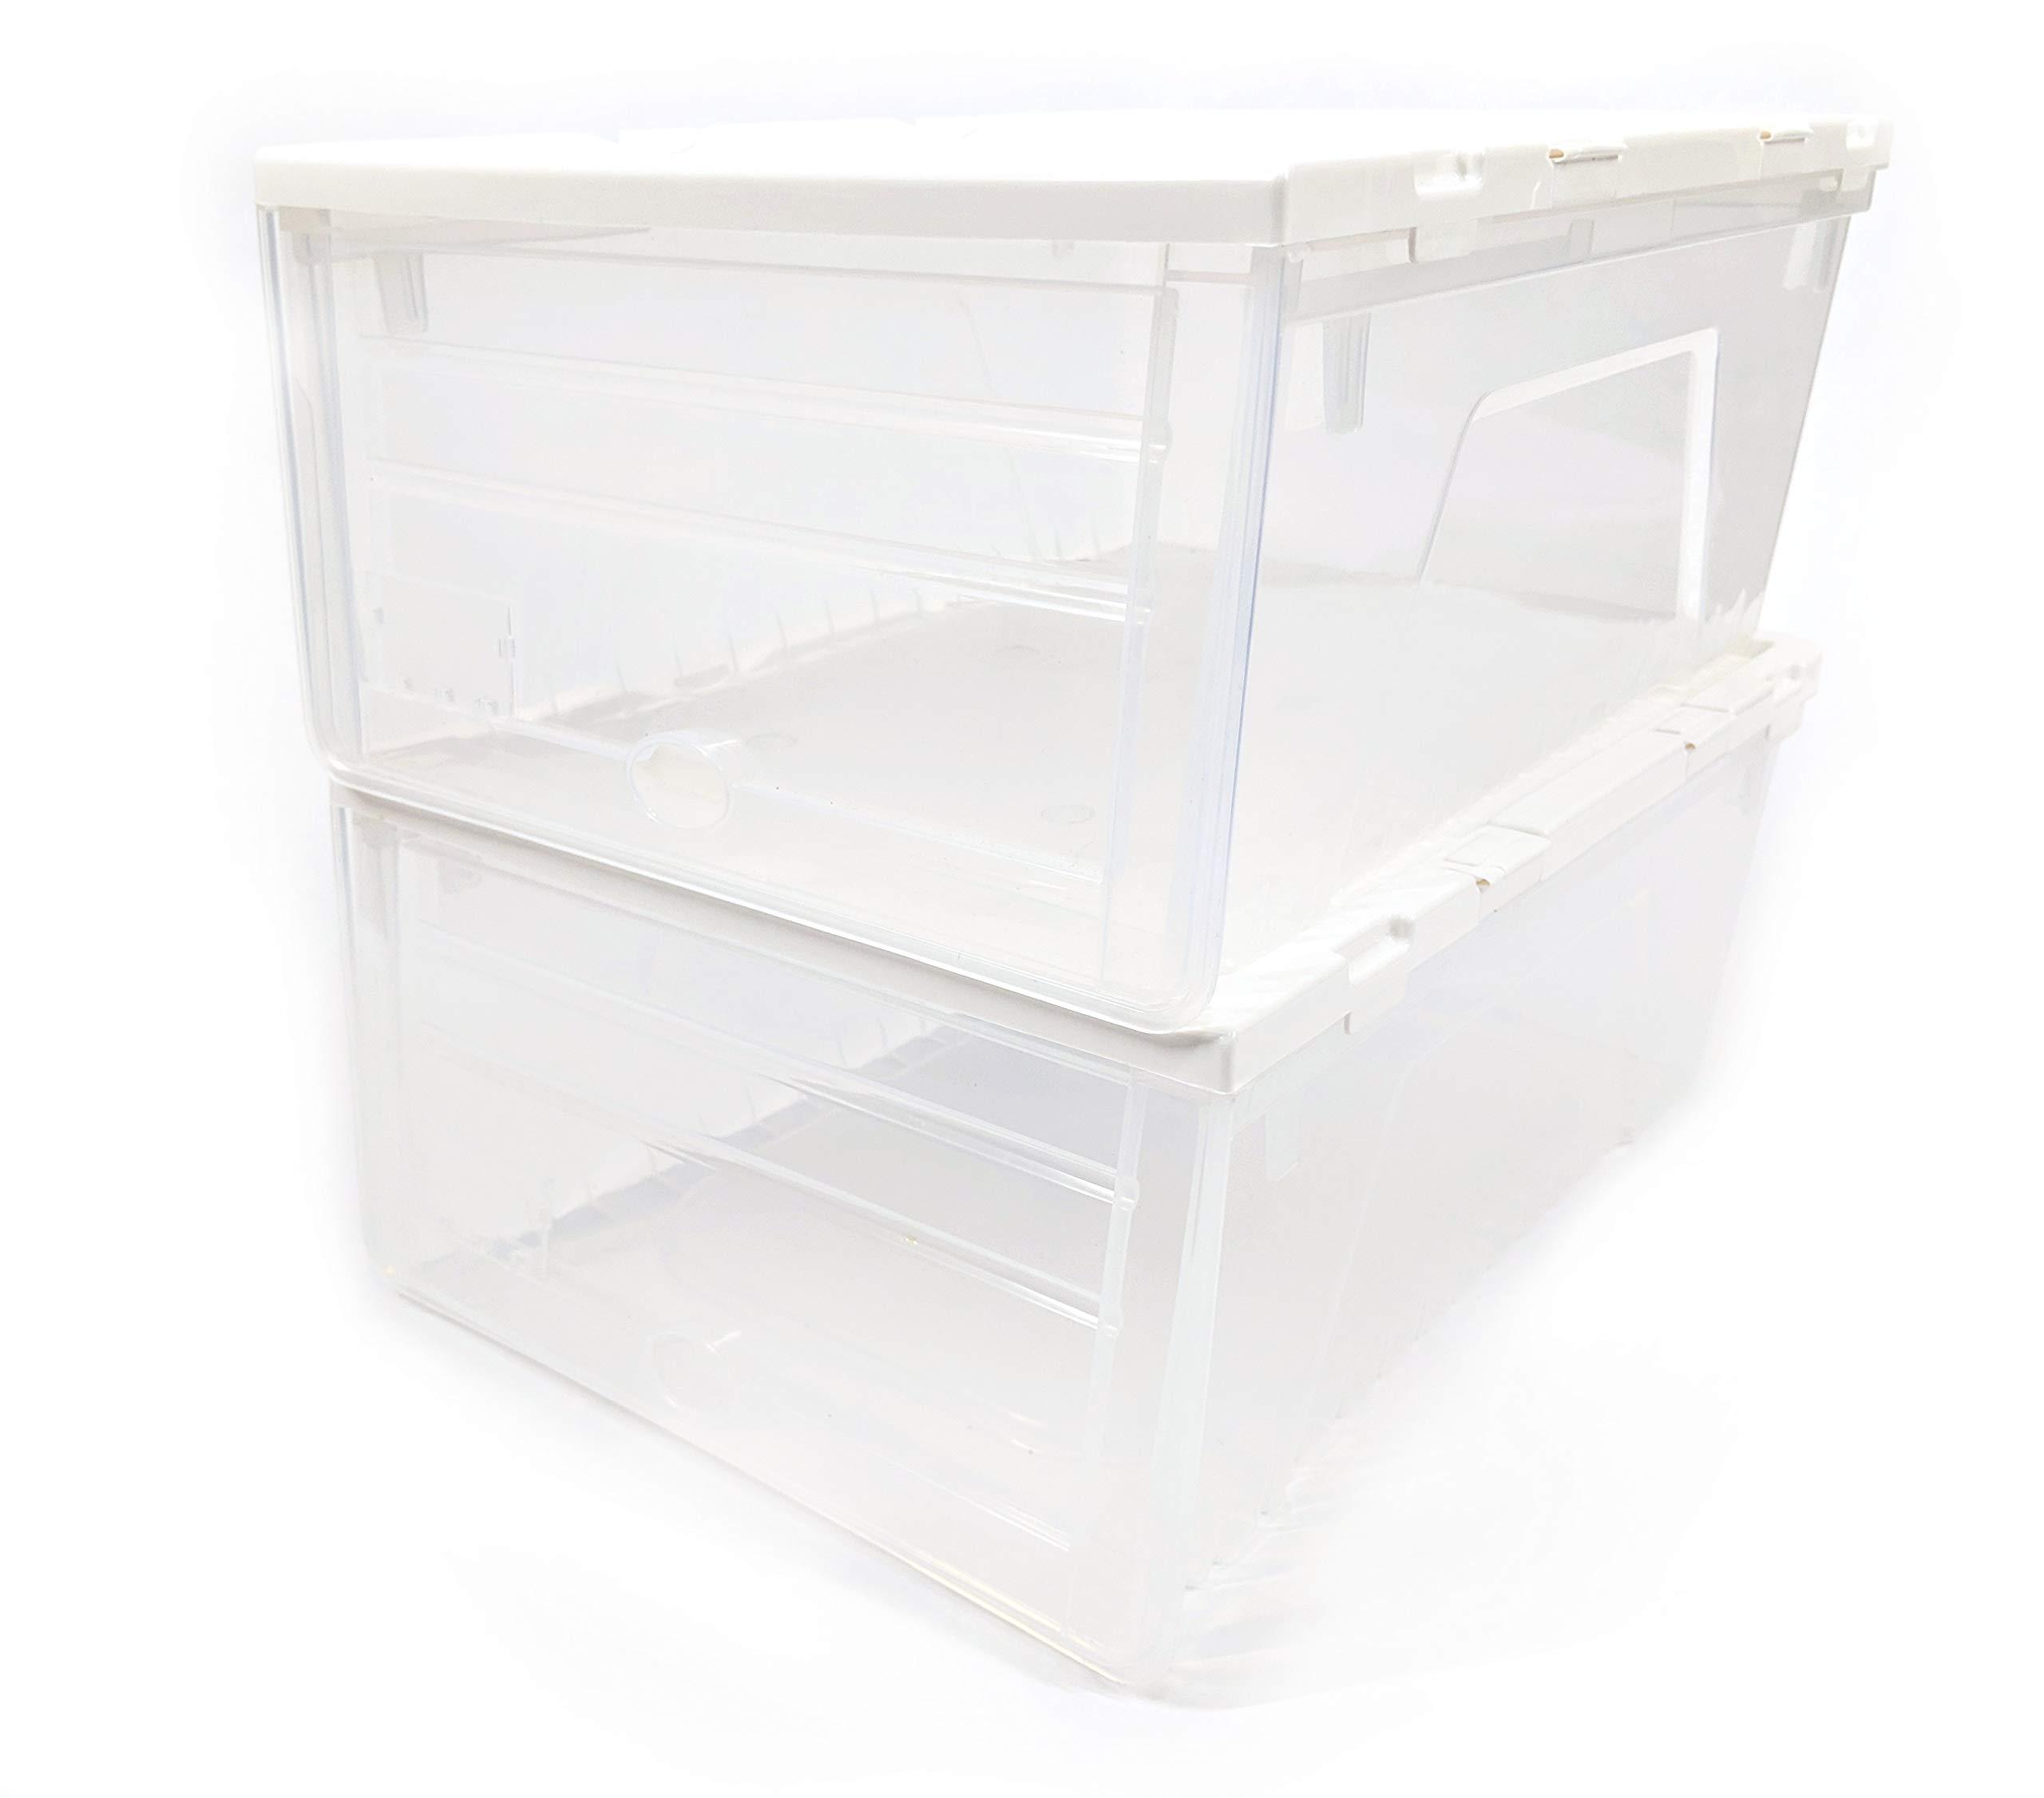 LapWorks Link-It Storage Boxes (Set of 2) - Accessory for The Link-It Cart (2 Storage Boxes) by LapWorks